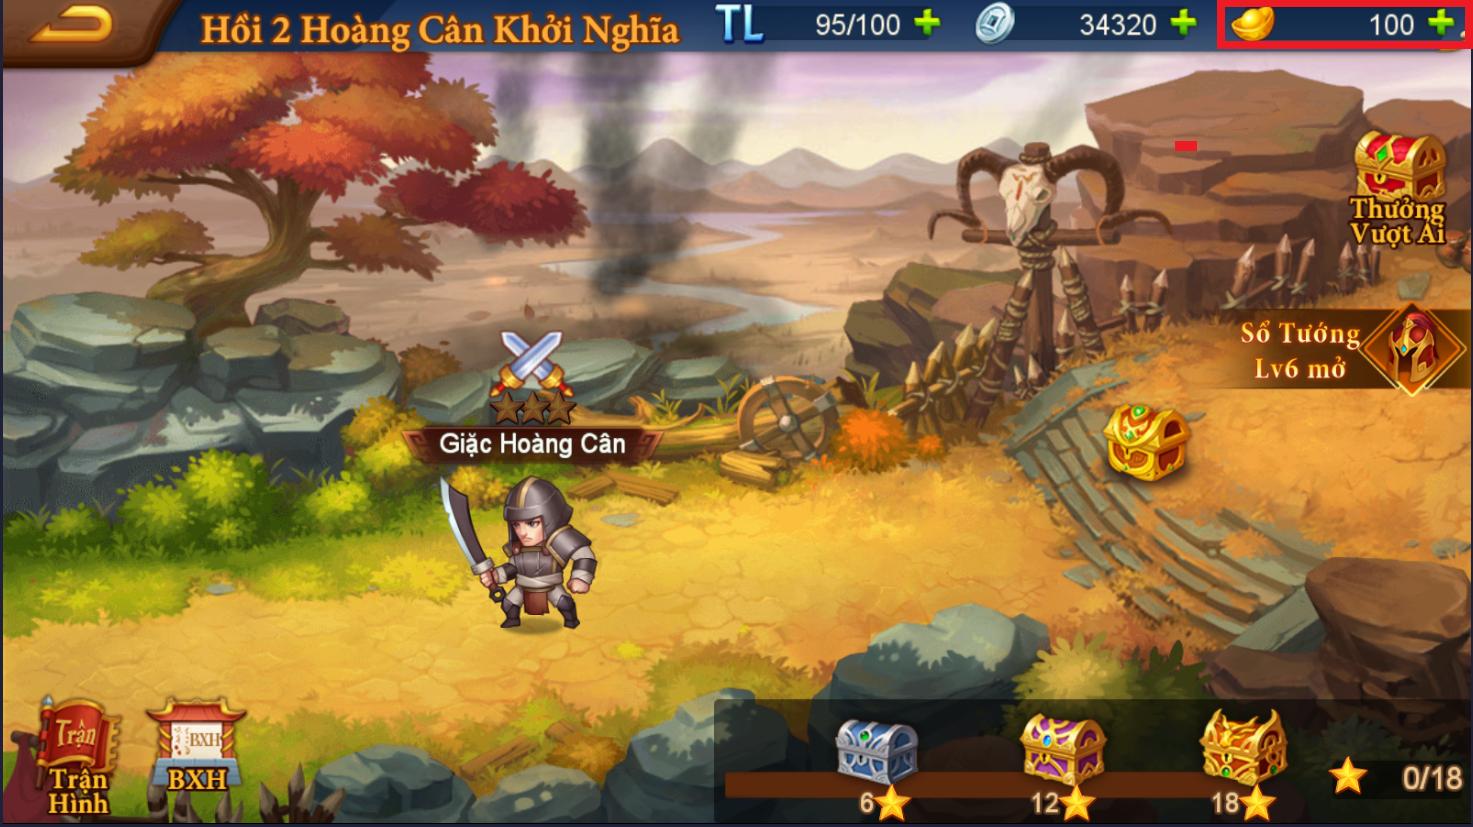 nap-danh-tuong-3q-sieu-toc-khong-can-the-game